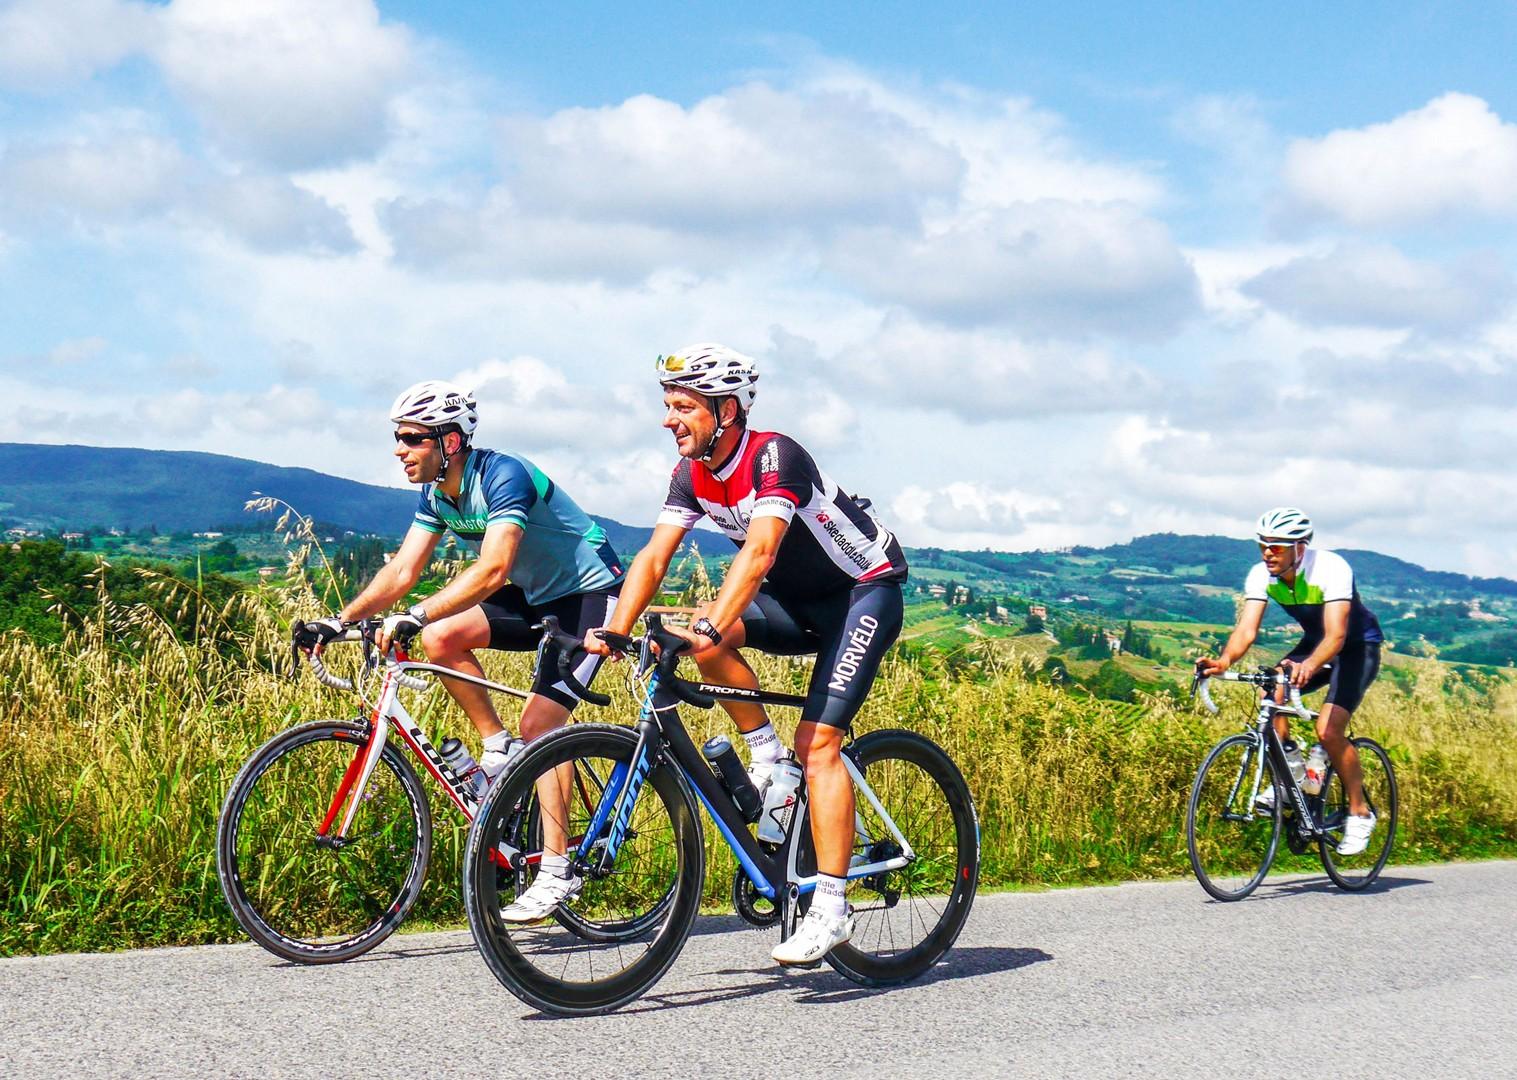 Davids grupetto.jpg - Italy - Tuscany Tourer - Road Cycling